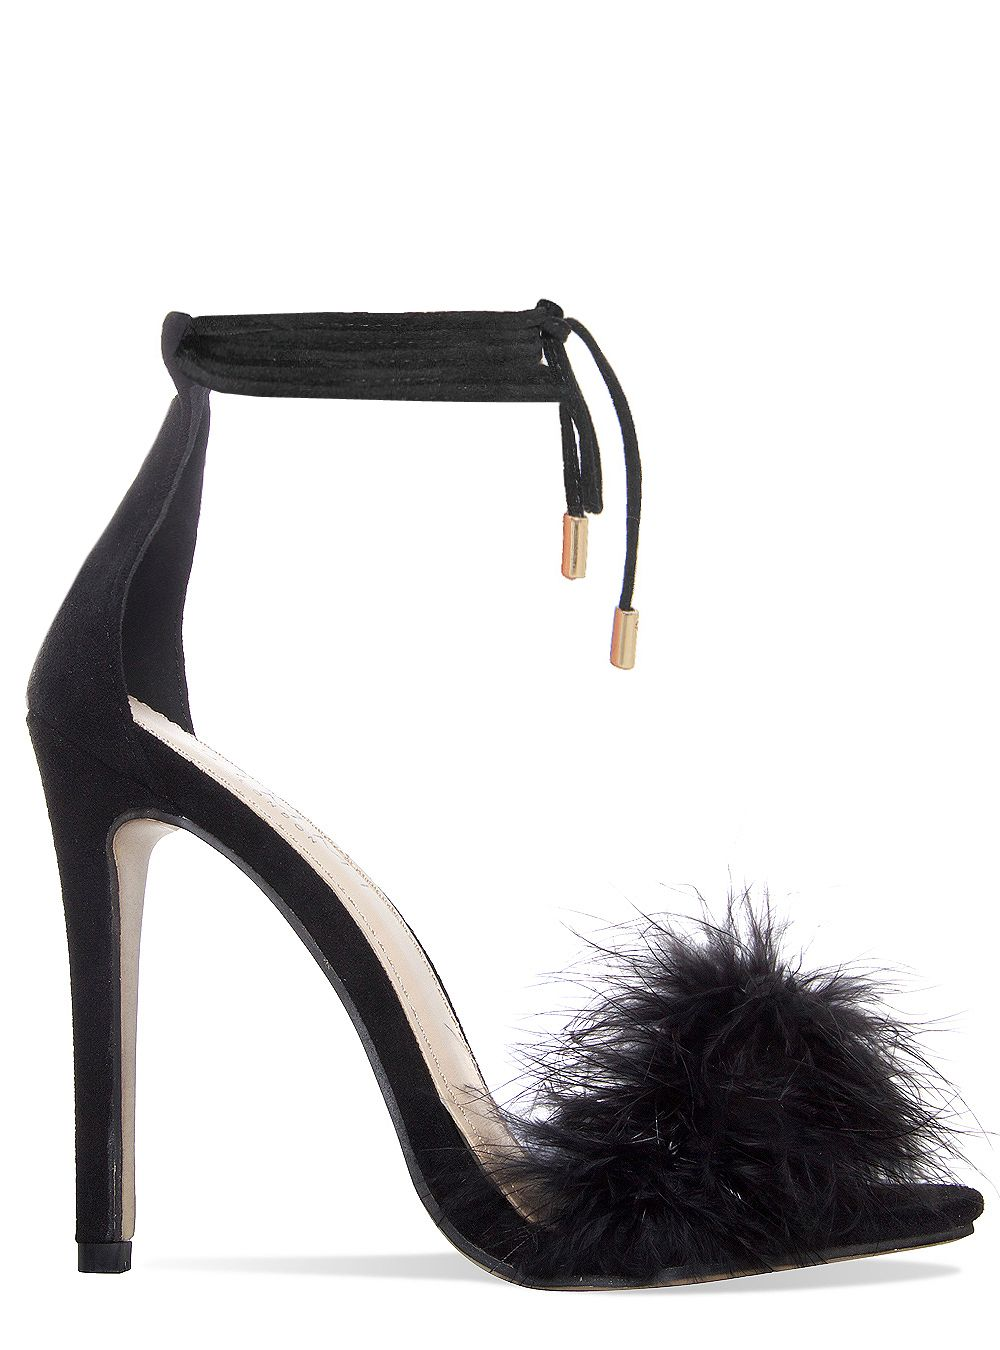 Tamaya Black Suede Fluffy Lace Up Heels